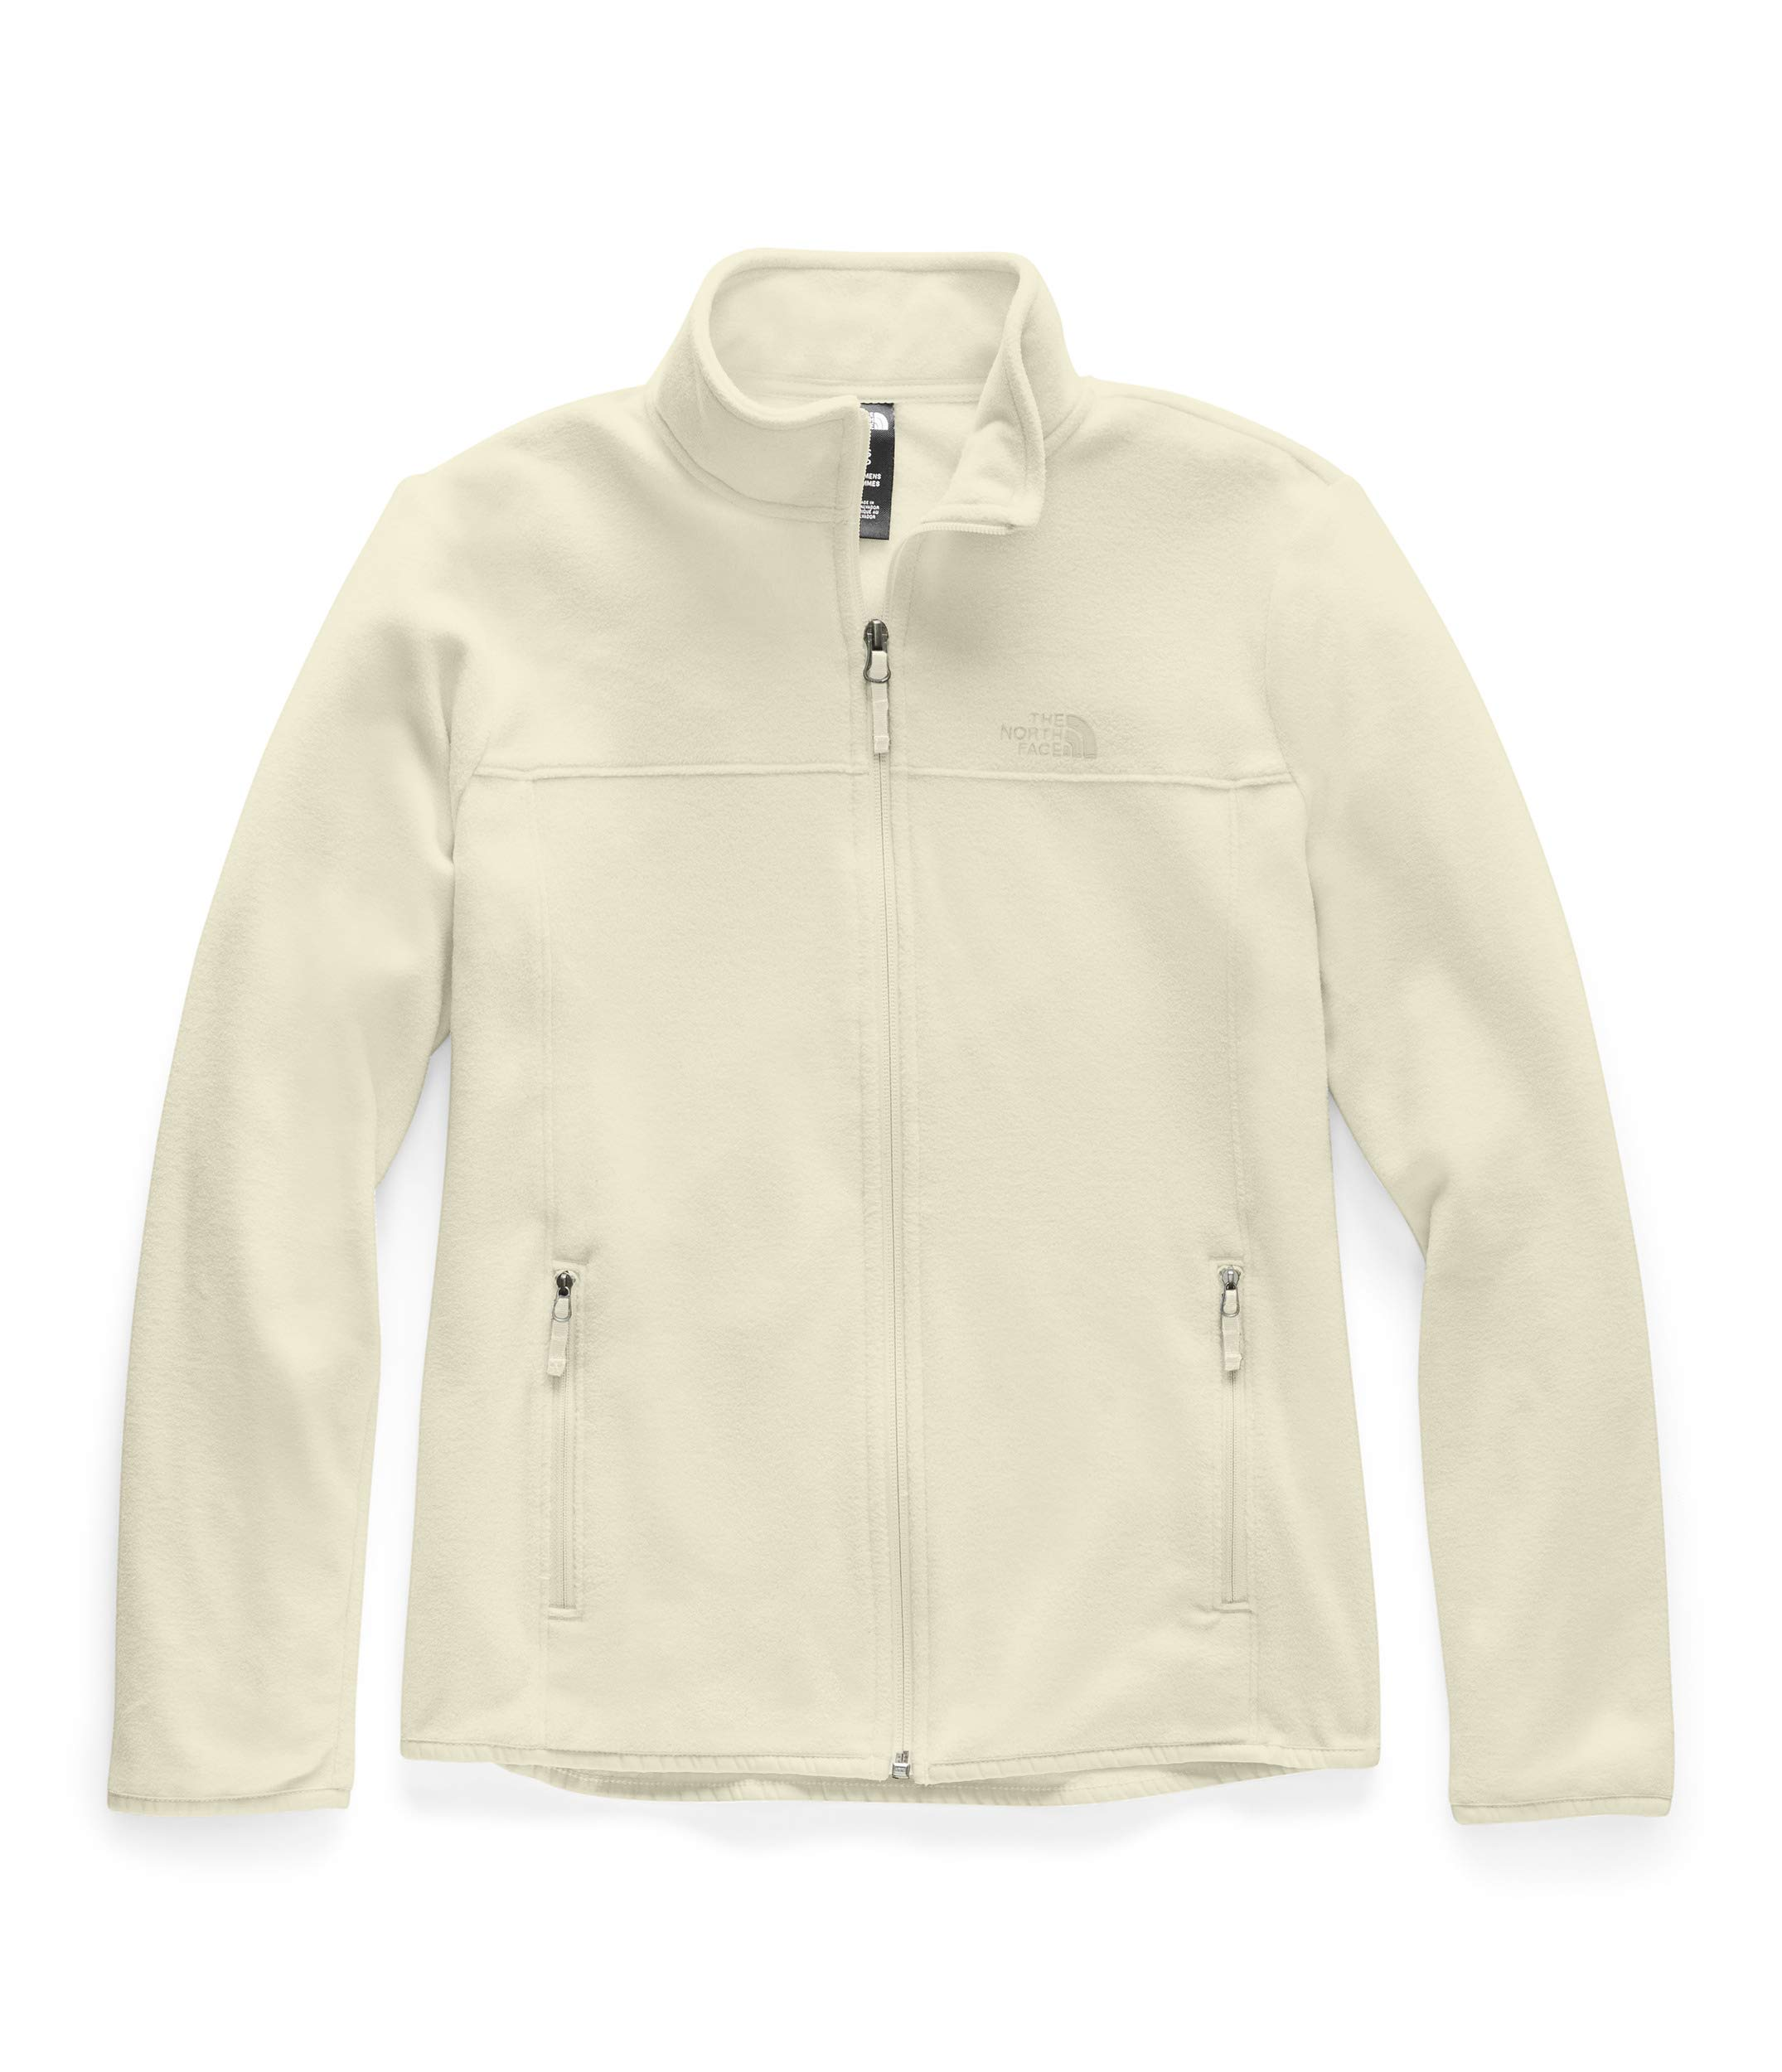 The North Face Women's TKA Glacier Full Zip Jacket, Vintage White/Vintage White, S by The North Face